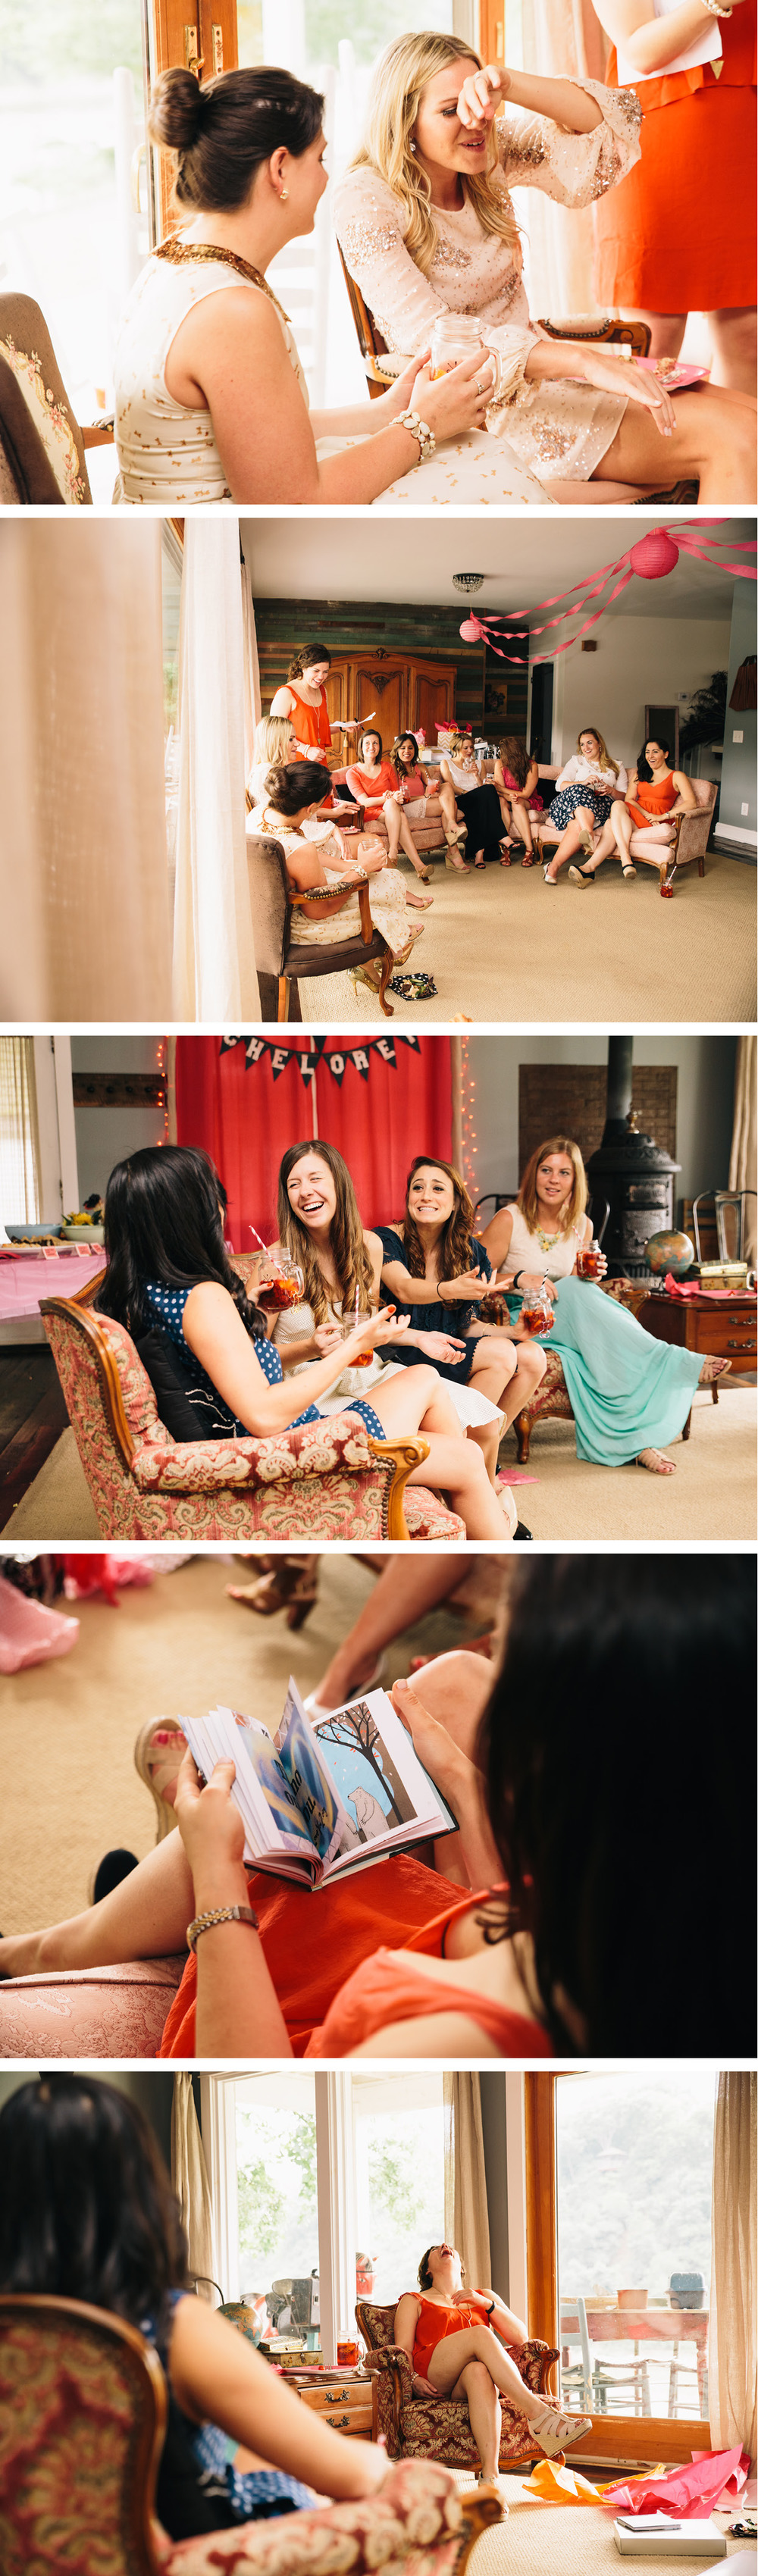 CK-Photo-Nashville-Wedding-Lifestyle-Photographer-cw5.jpg